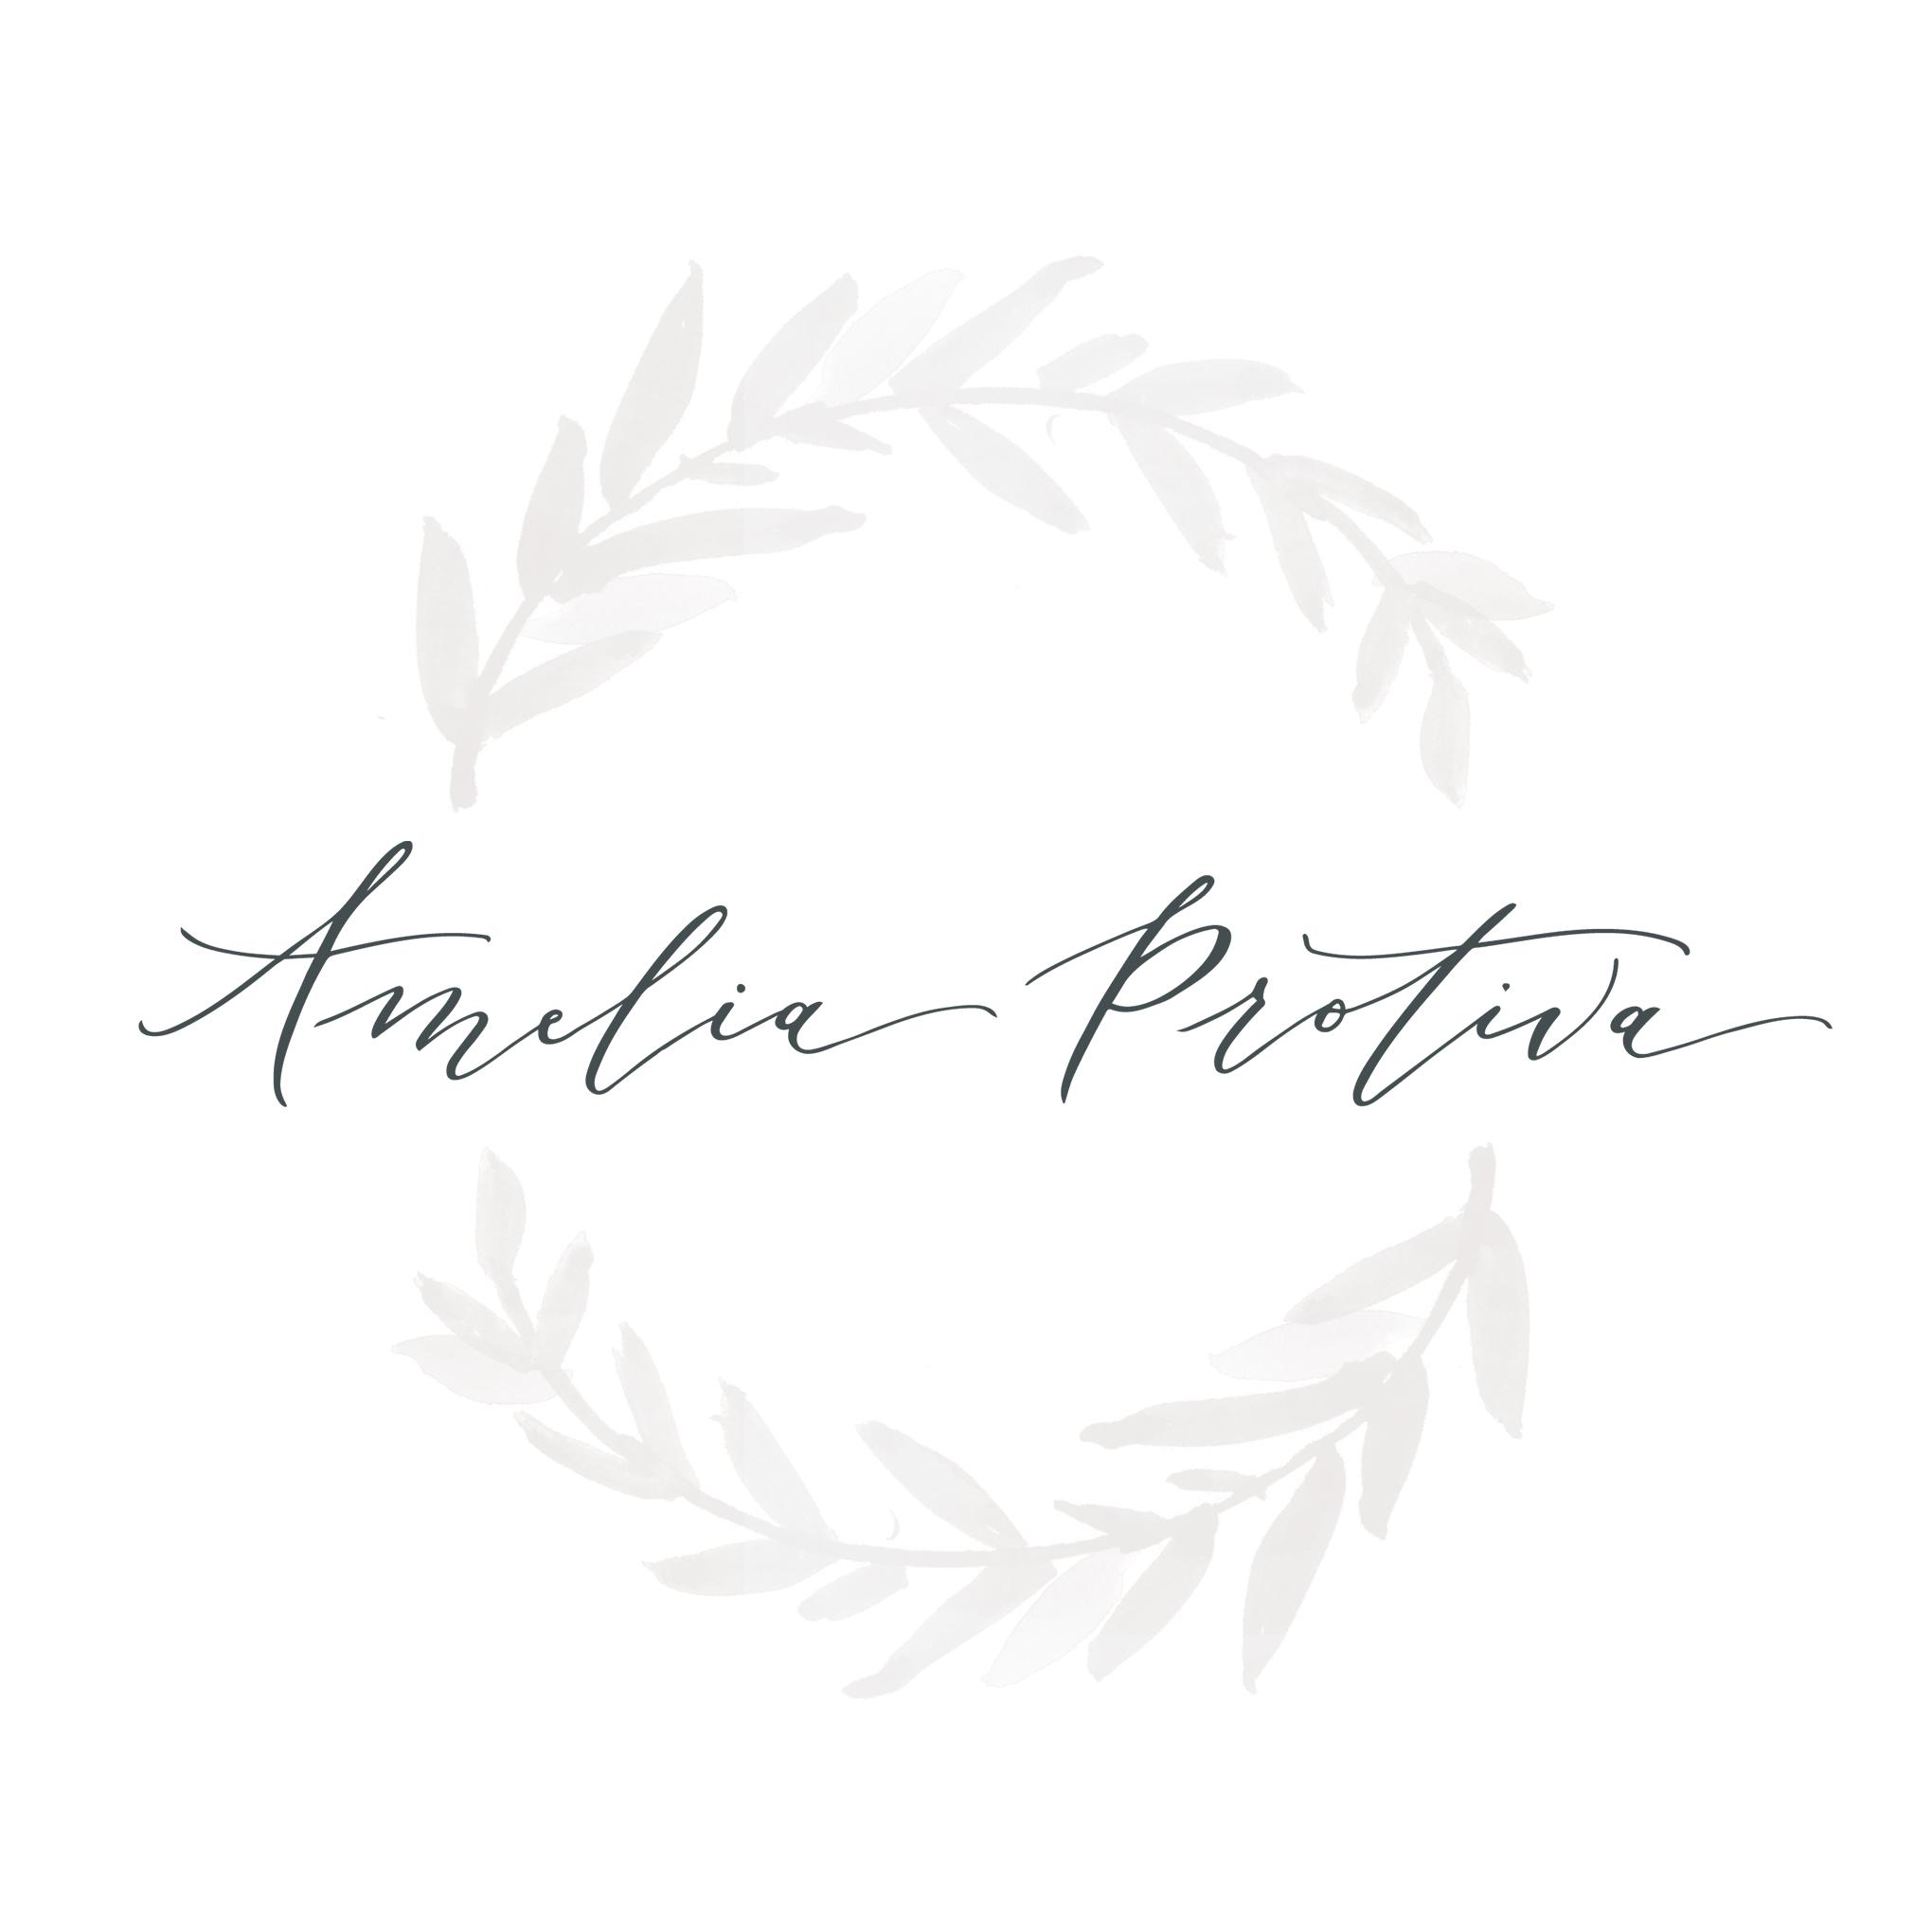 Amelia Protiva Wreath Logo.jpg